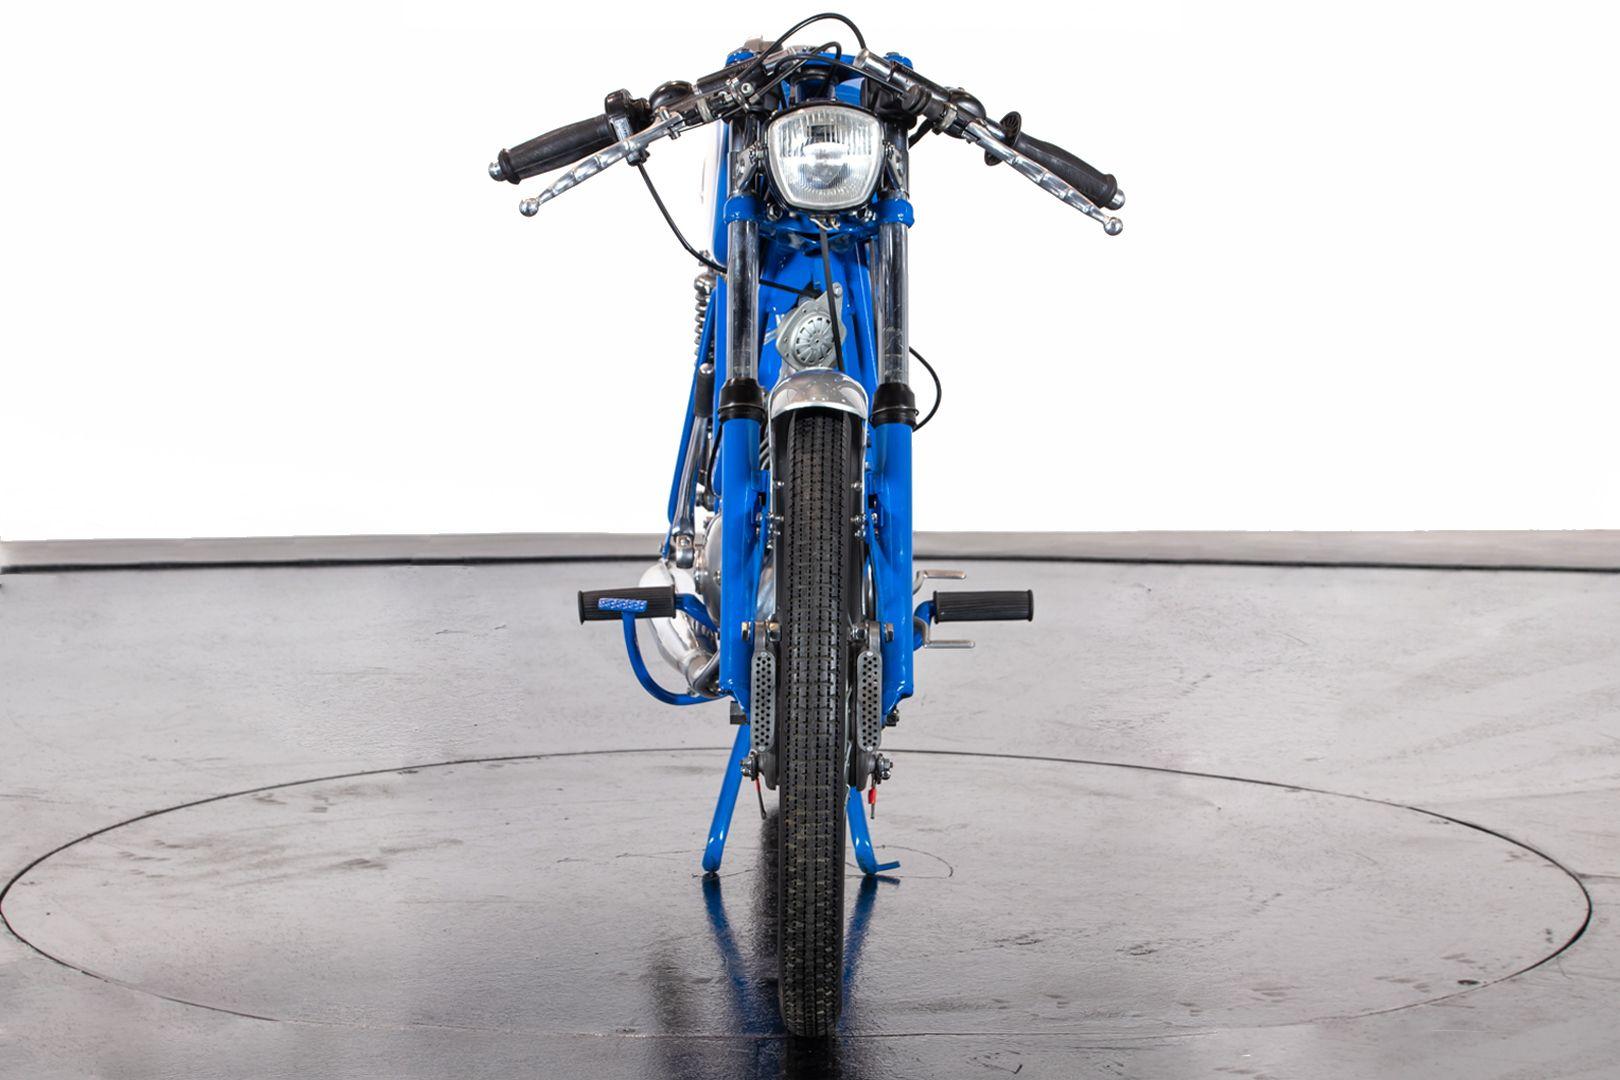 1970 ITALJET 50 58523